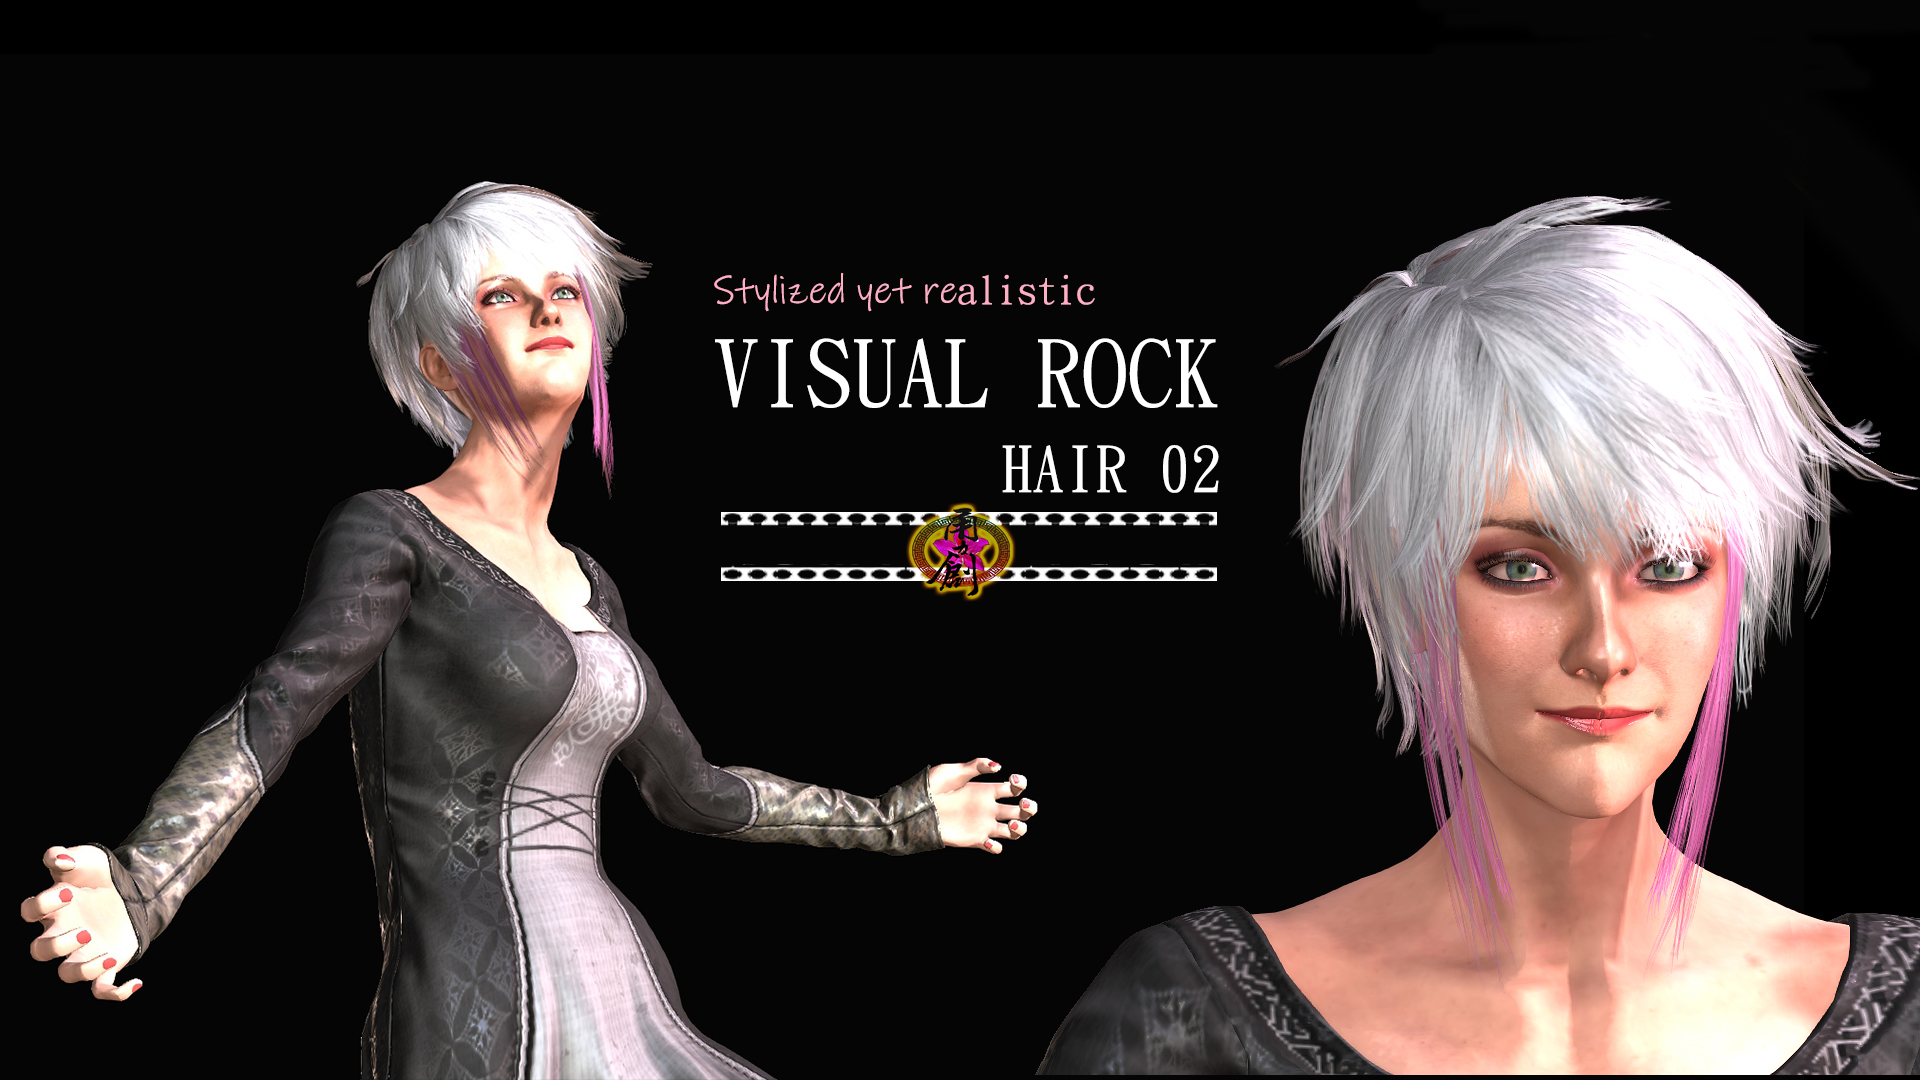 https://forum.reallusion.com/uploads/images/9929ef68-fab3-4646-b46d-b602.jpg